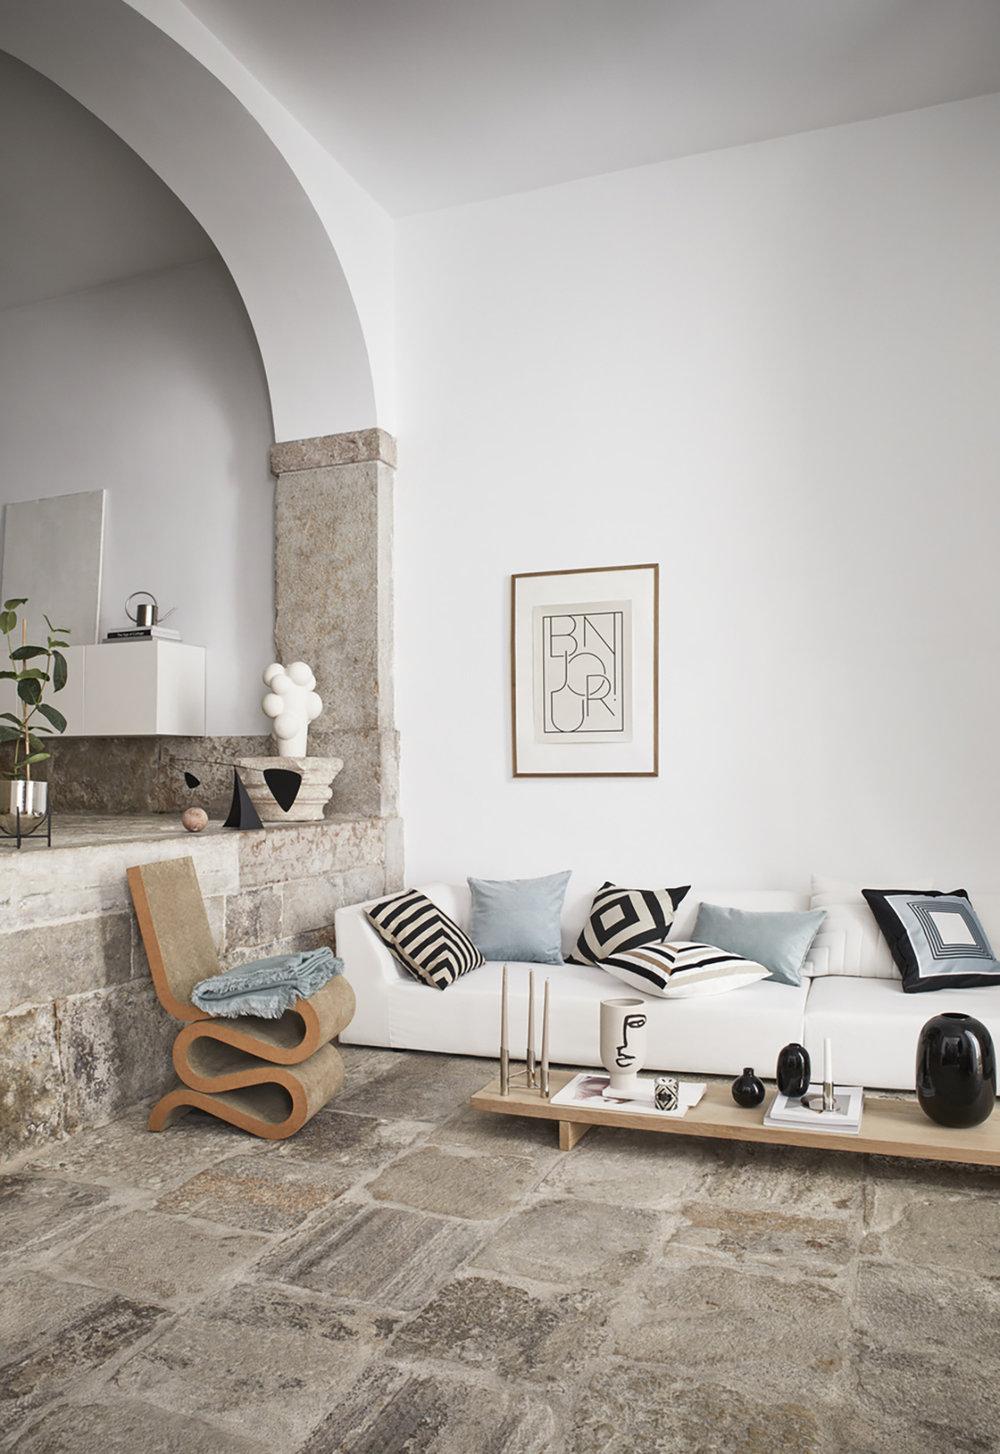 H&M Home Spring 2019 1 1200px.jpg